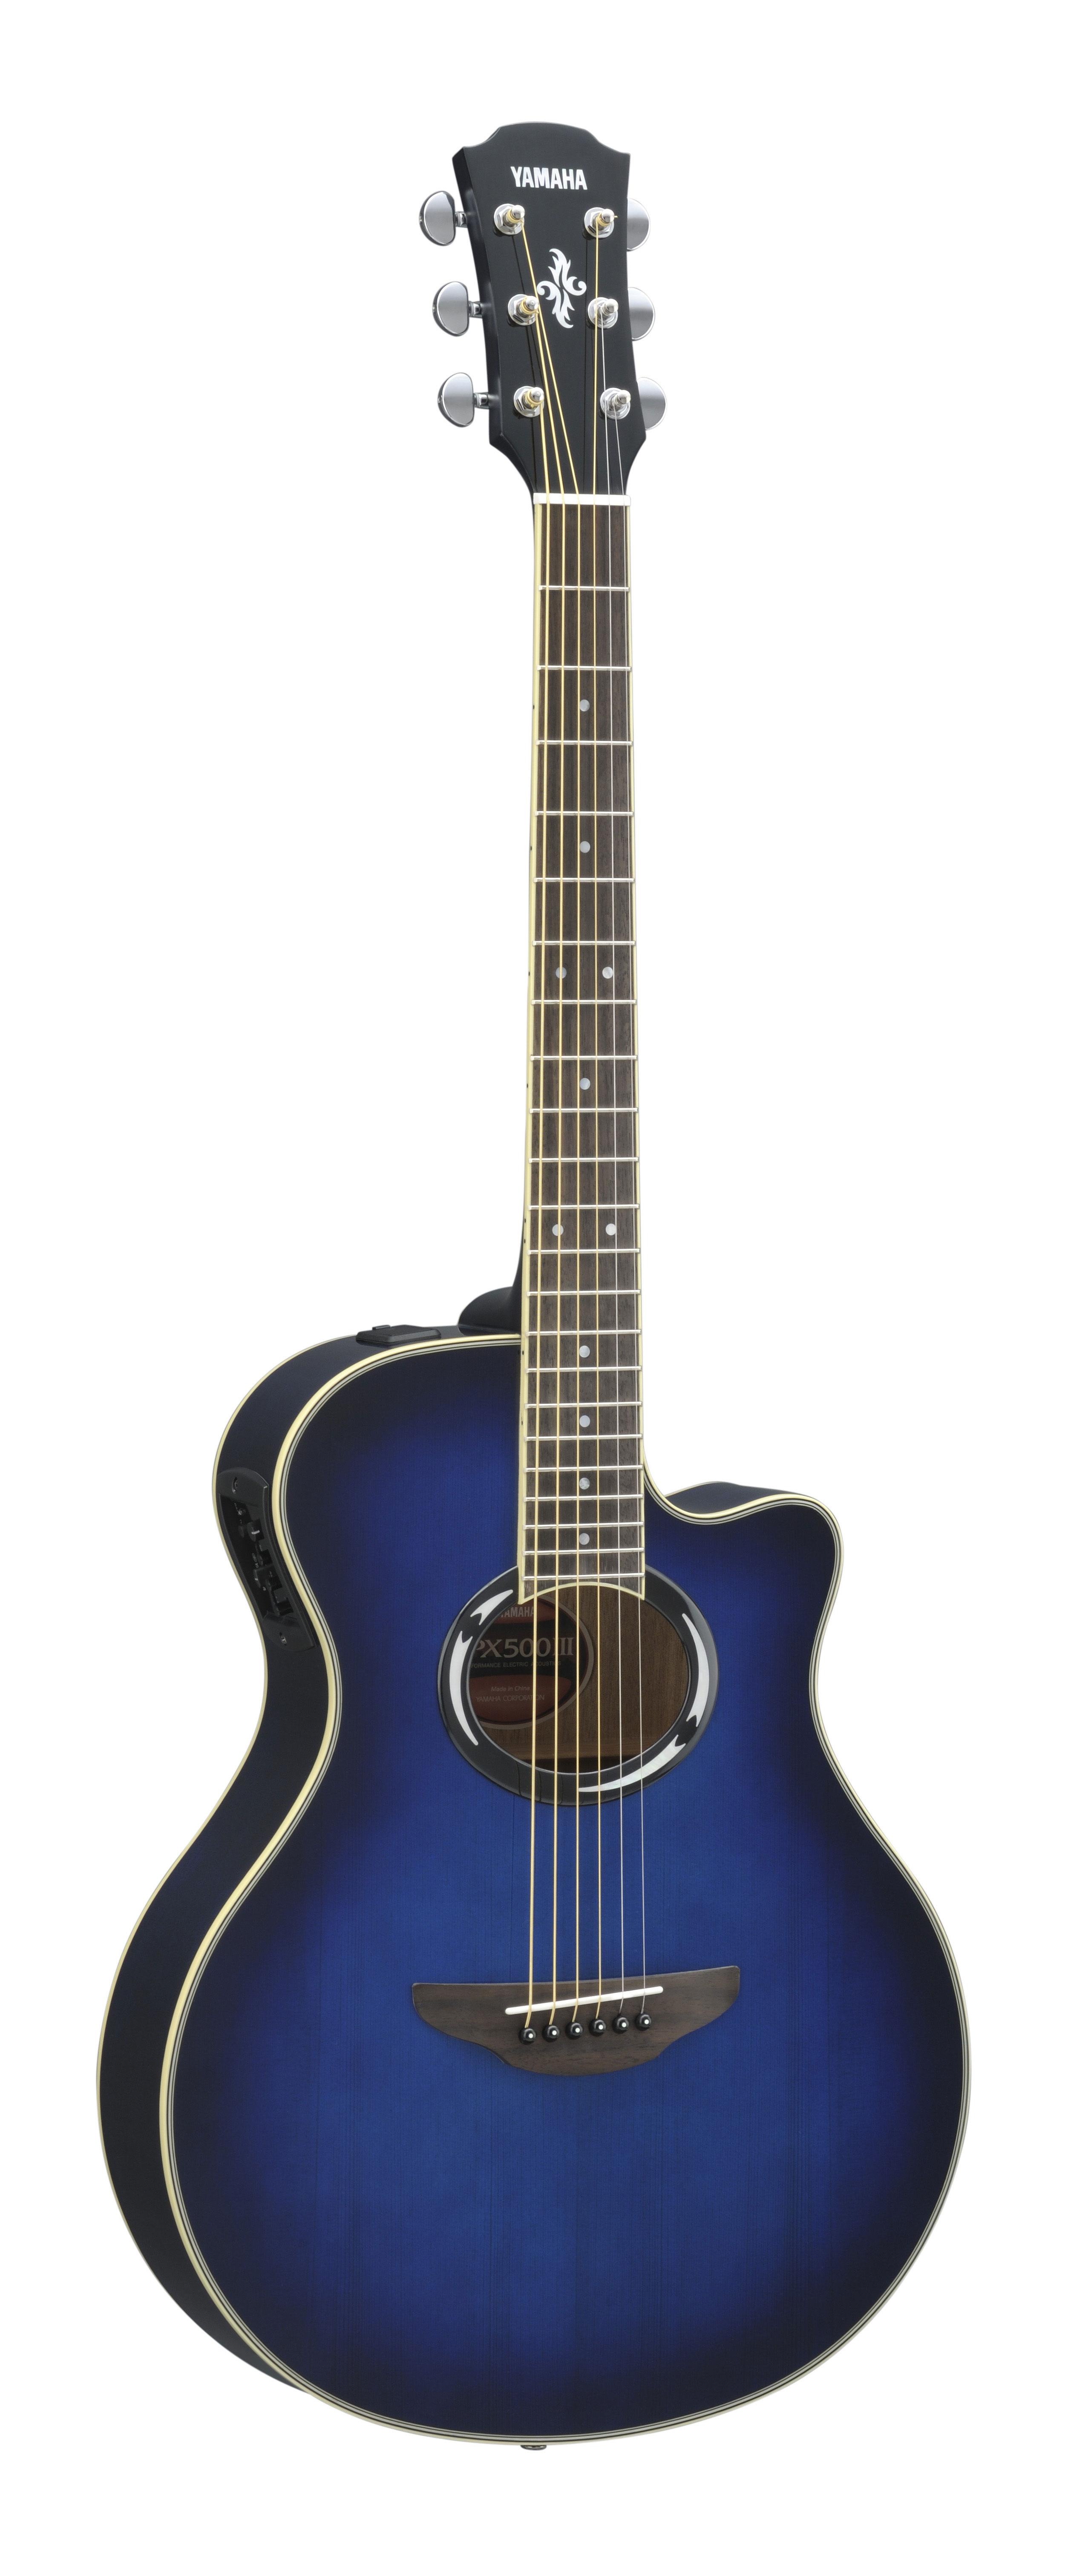 Yamaha - APX500III OBB - Oriental Blue Burst